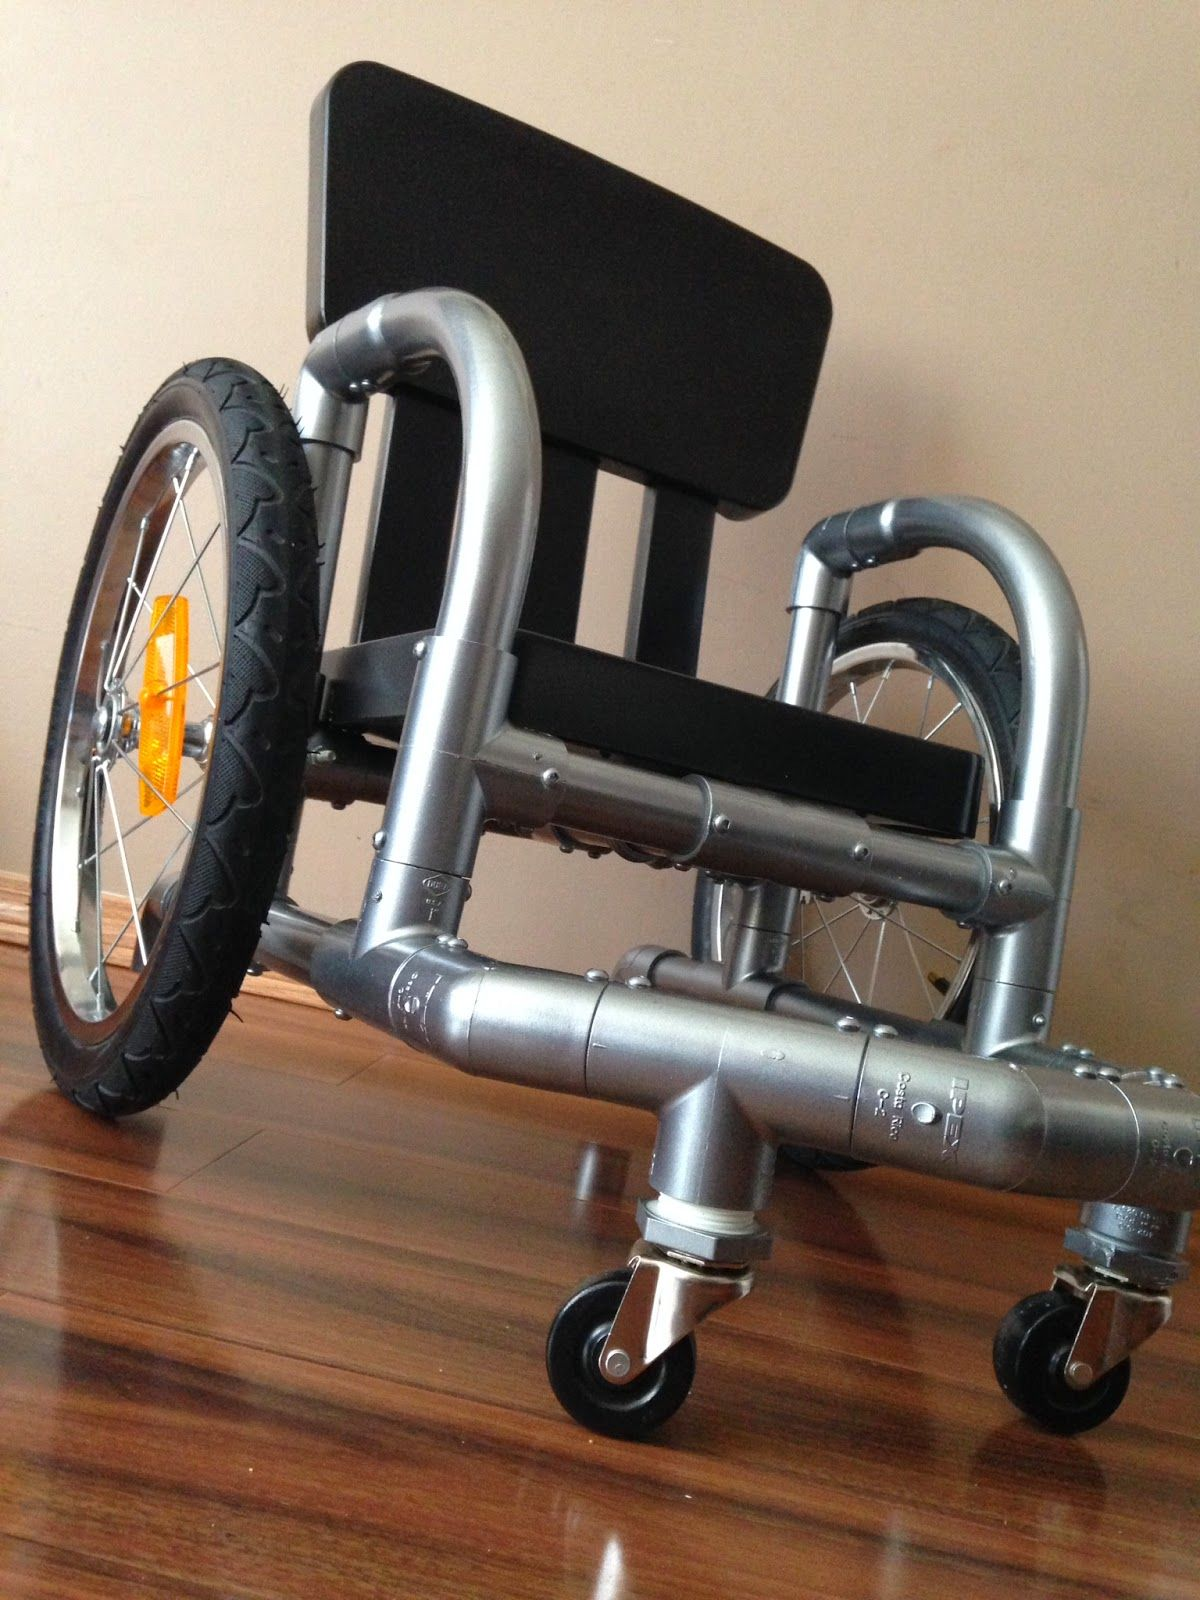 wheelchair equipment norwegian posture chair diy adaptive homemade pediatric stickarazzi com adventures of my stick figure family living with special needs getting crafty